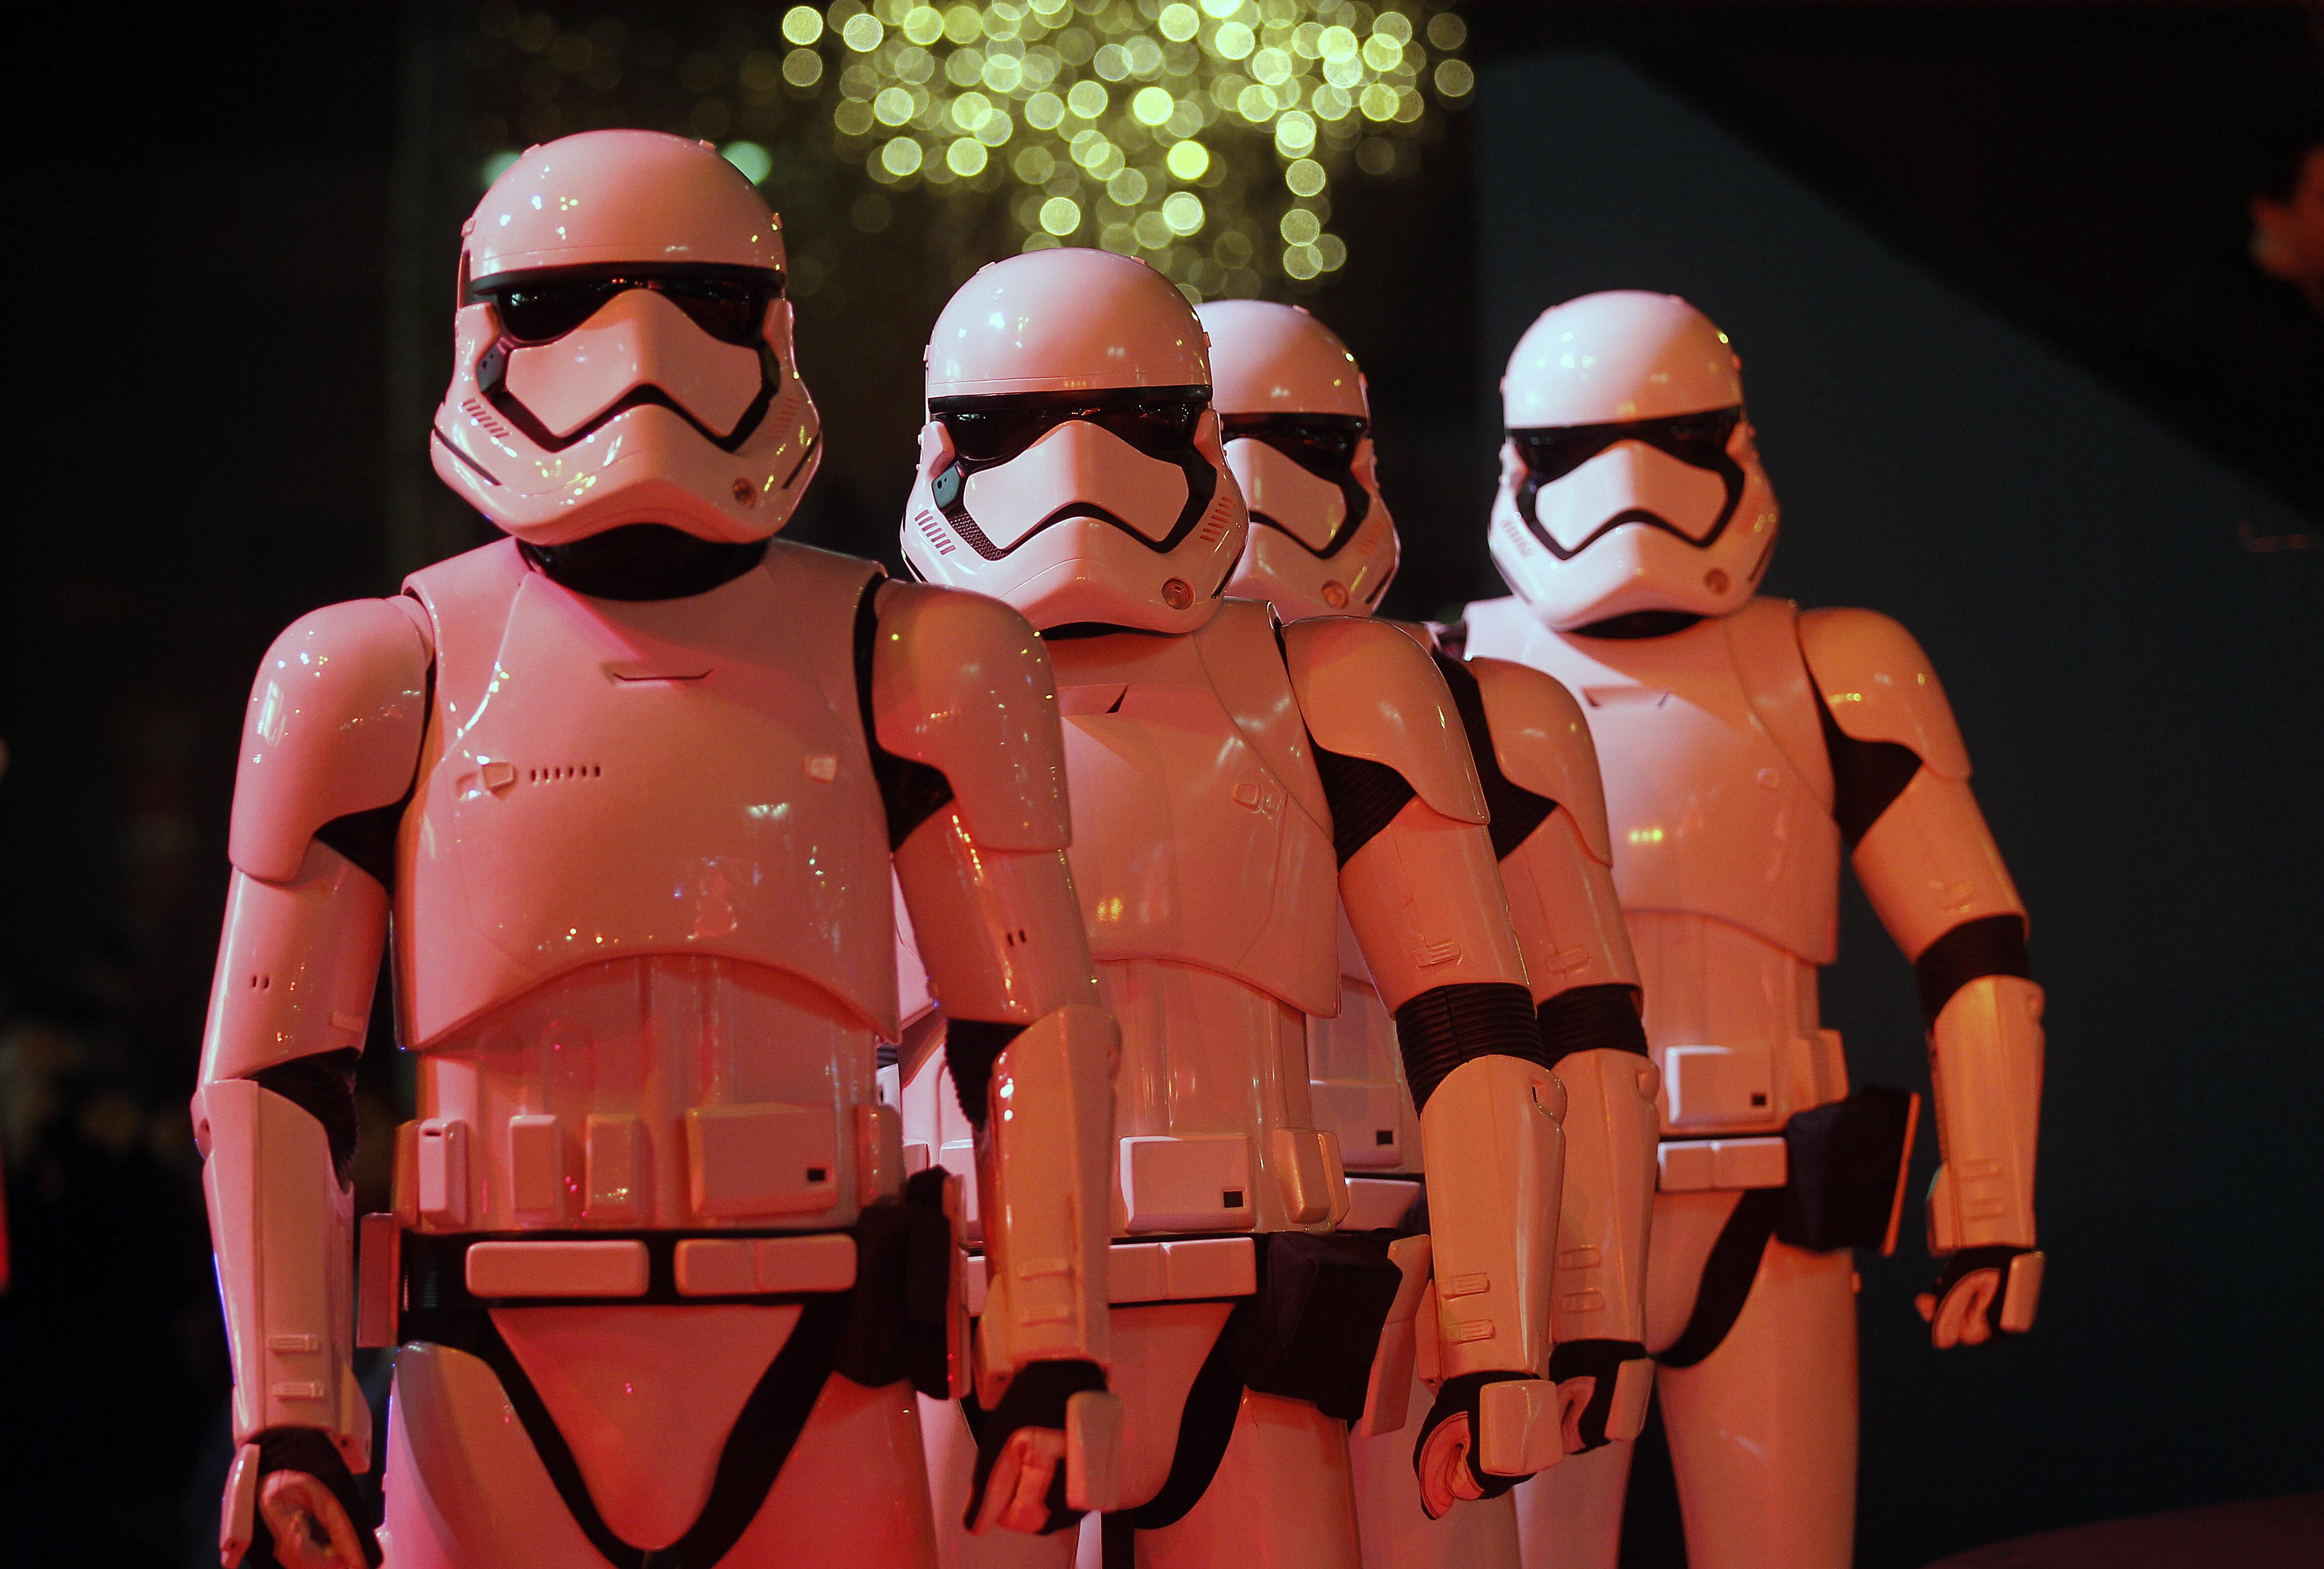 """Star Wars X Galeries Lafayette"" : Galeries Lafayette Christmas Decorations Inauguration In Paris"